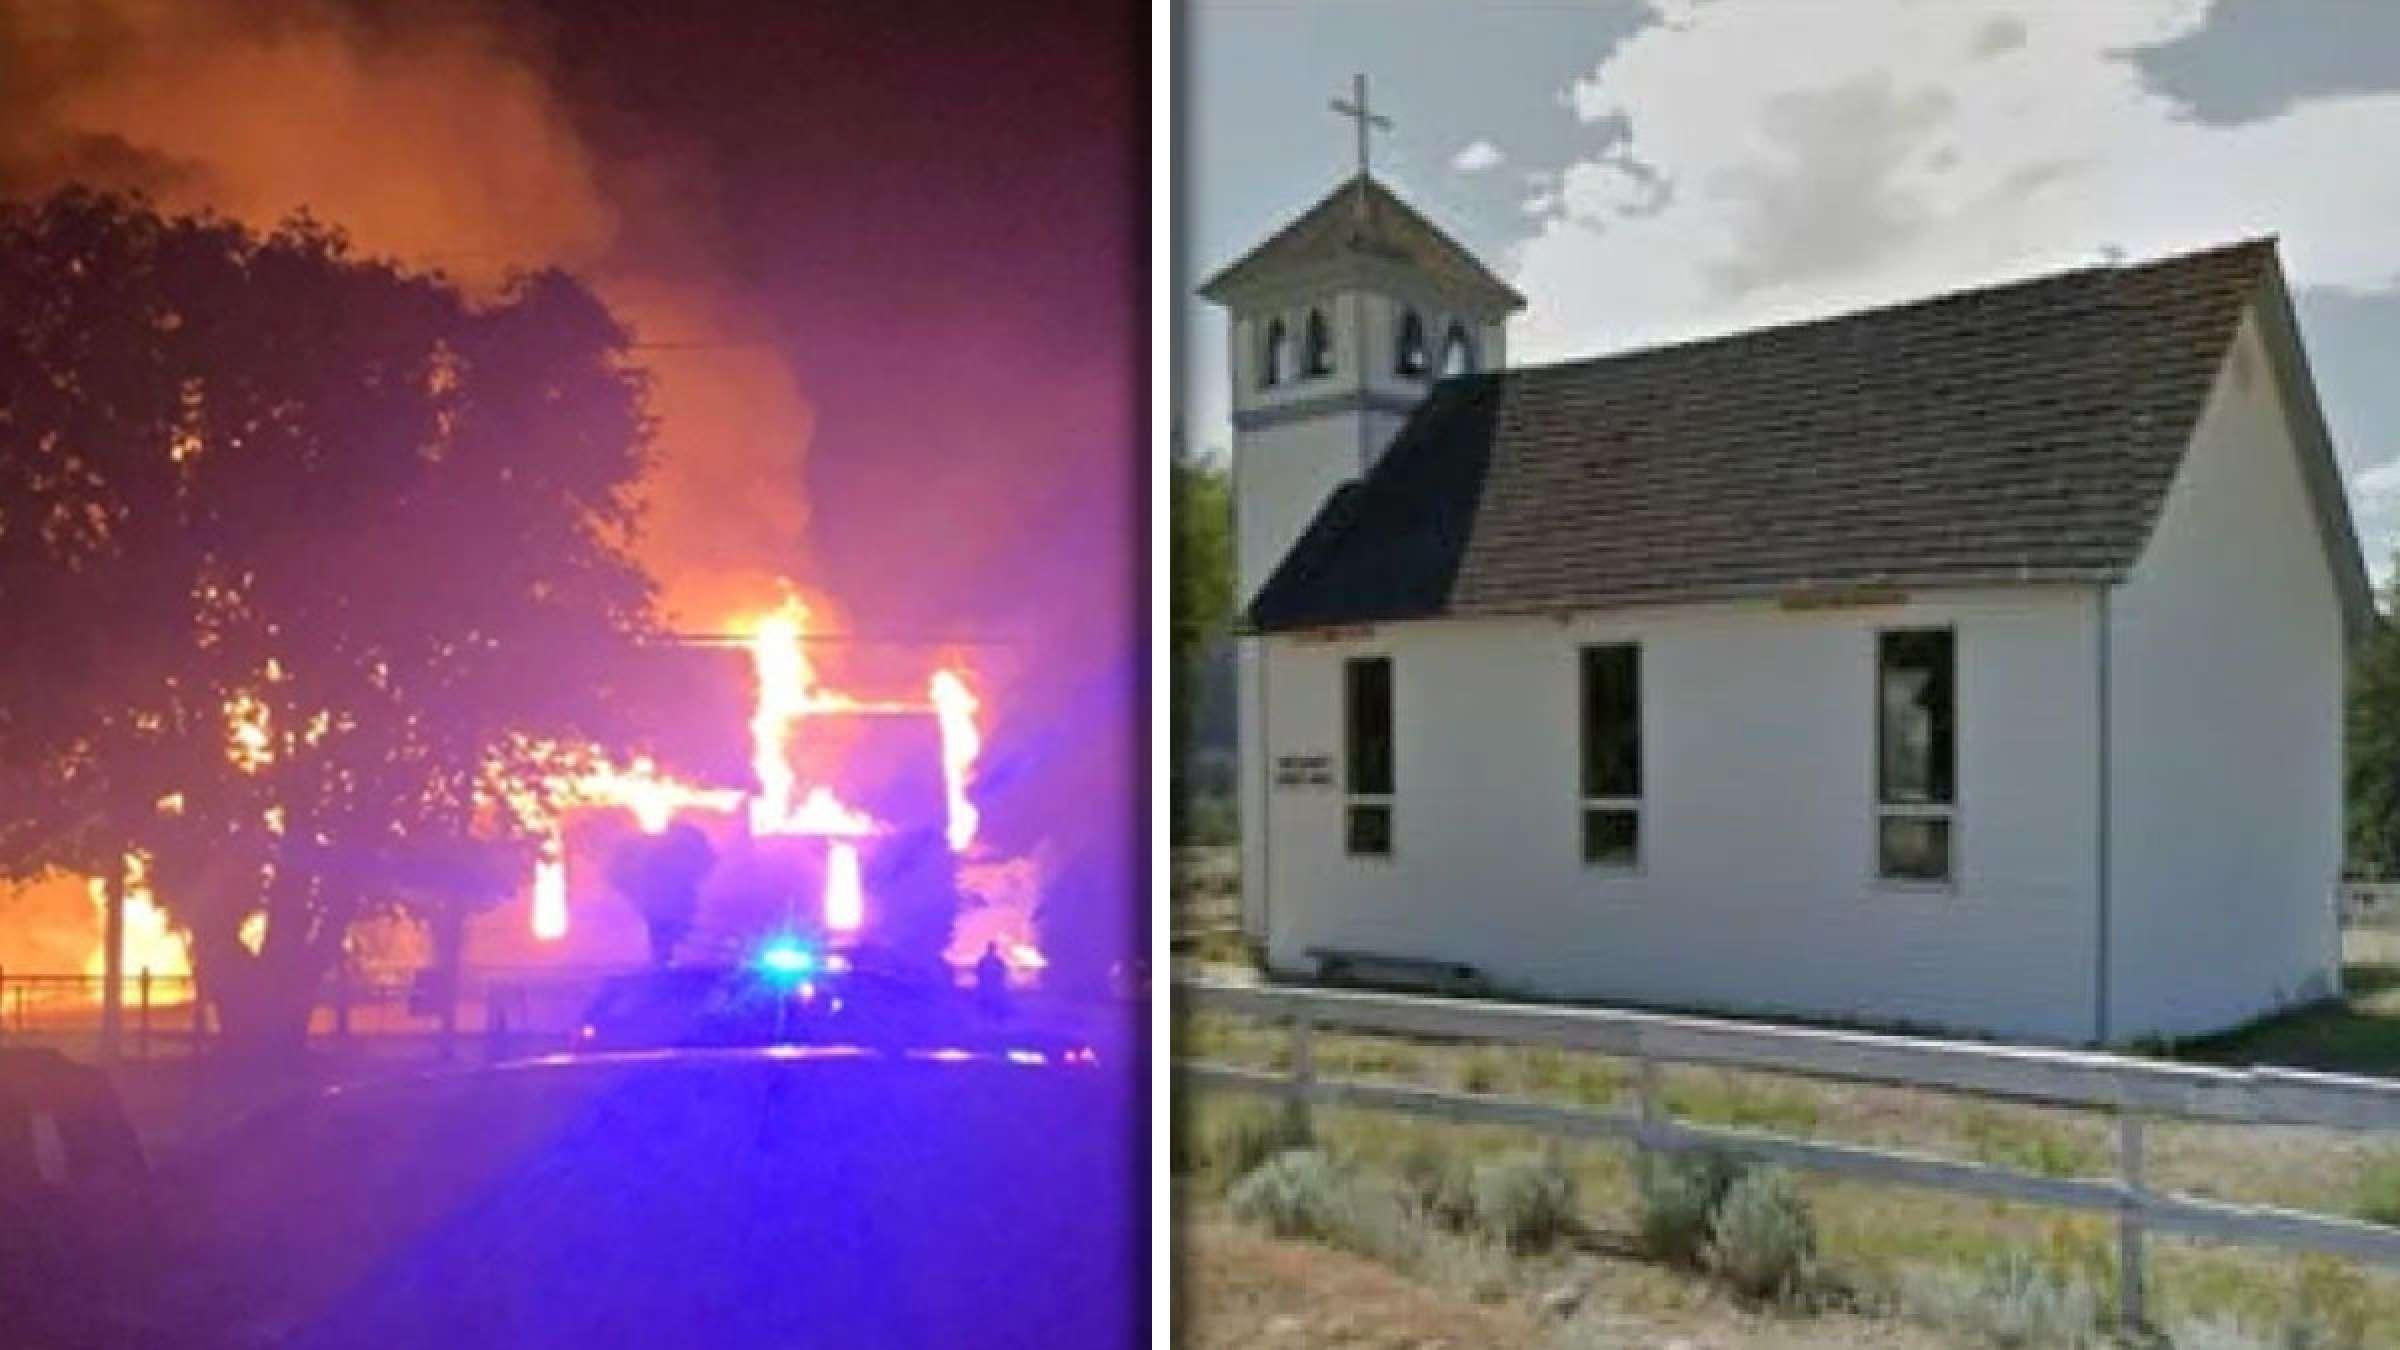 خبر-کانادا-دو-کلیسای-کاتولیک-در-شرق-ونکوور-به-آتش-کشیده-شدند